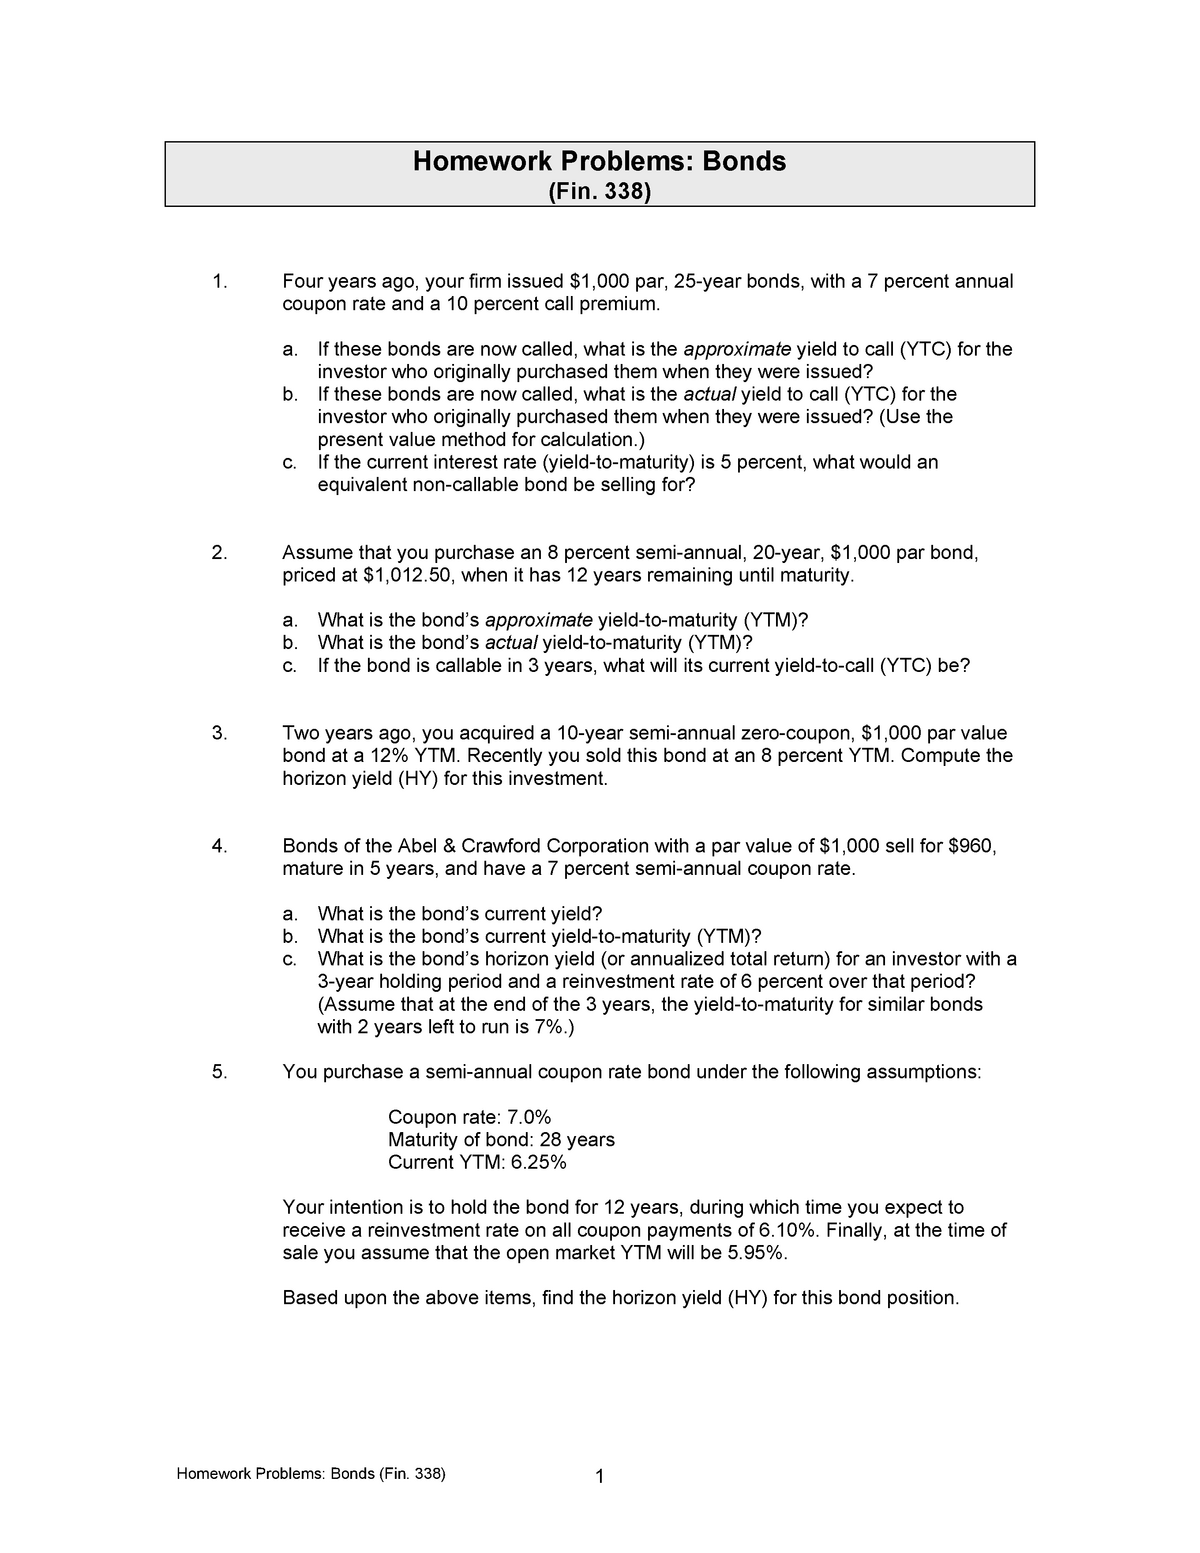 Homework Problems-Bonds (Fin  338)-Expanded (w - FIN 338